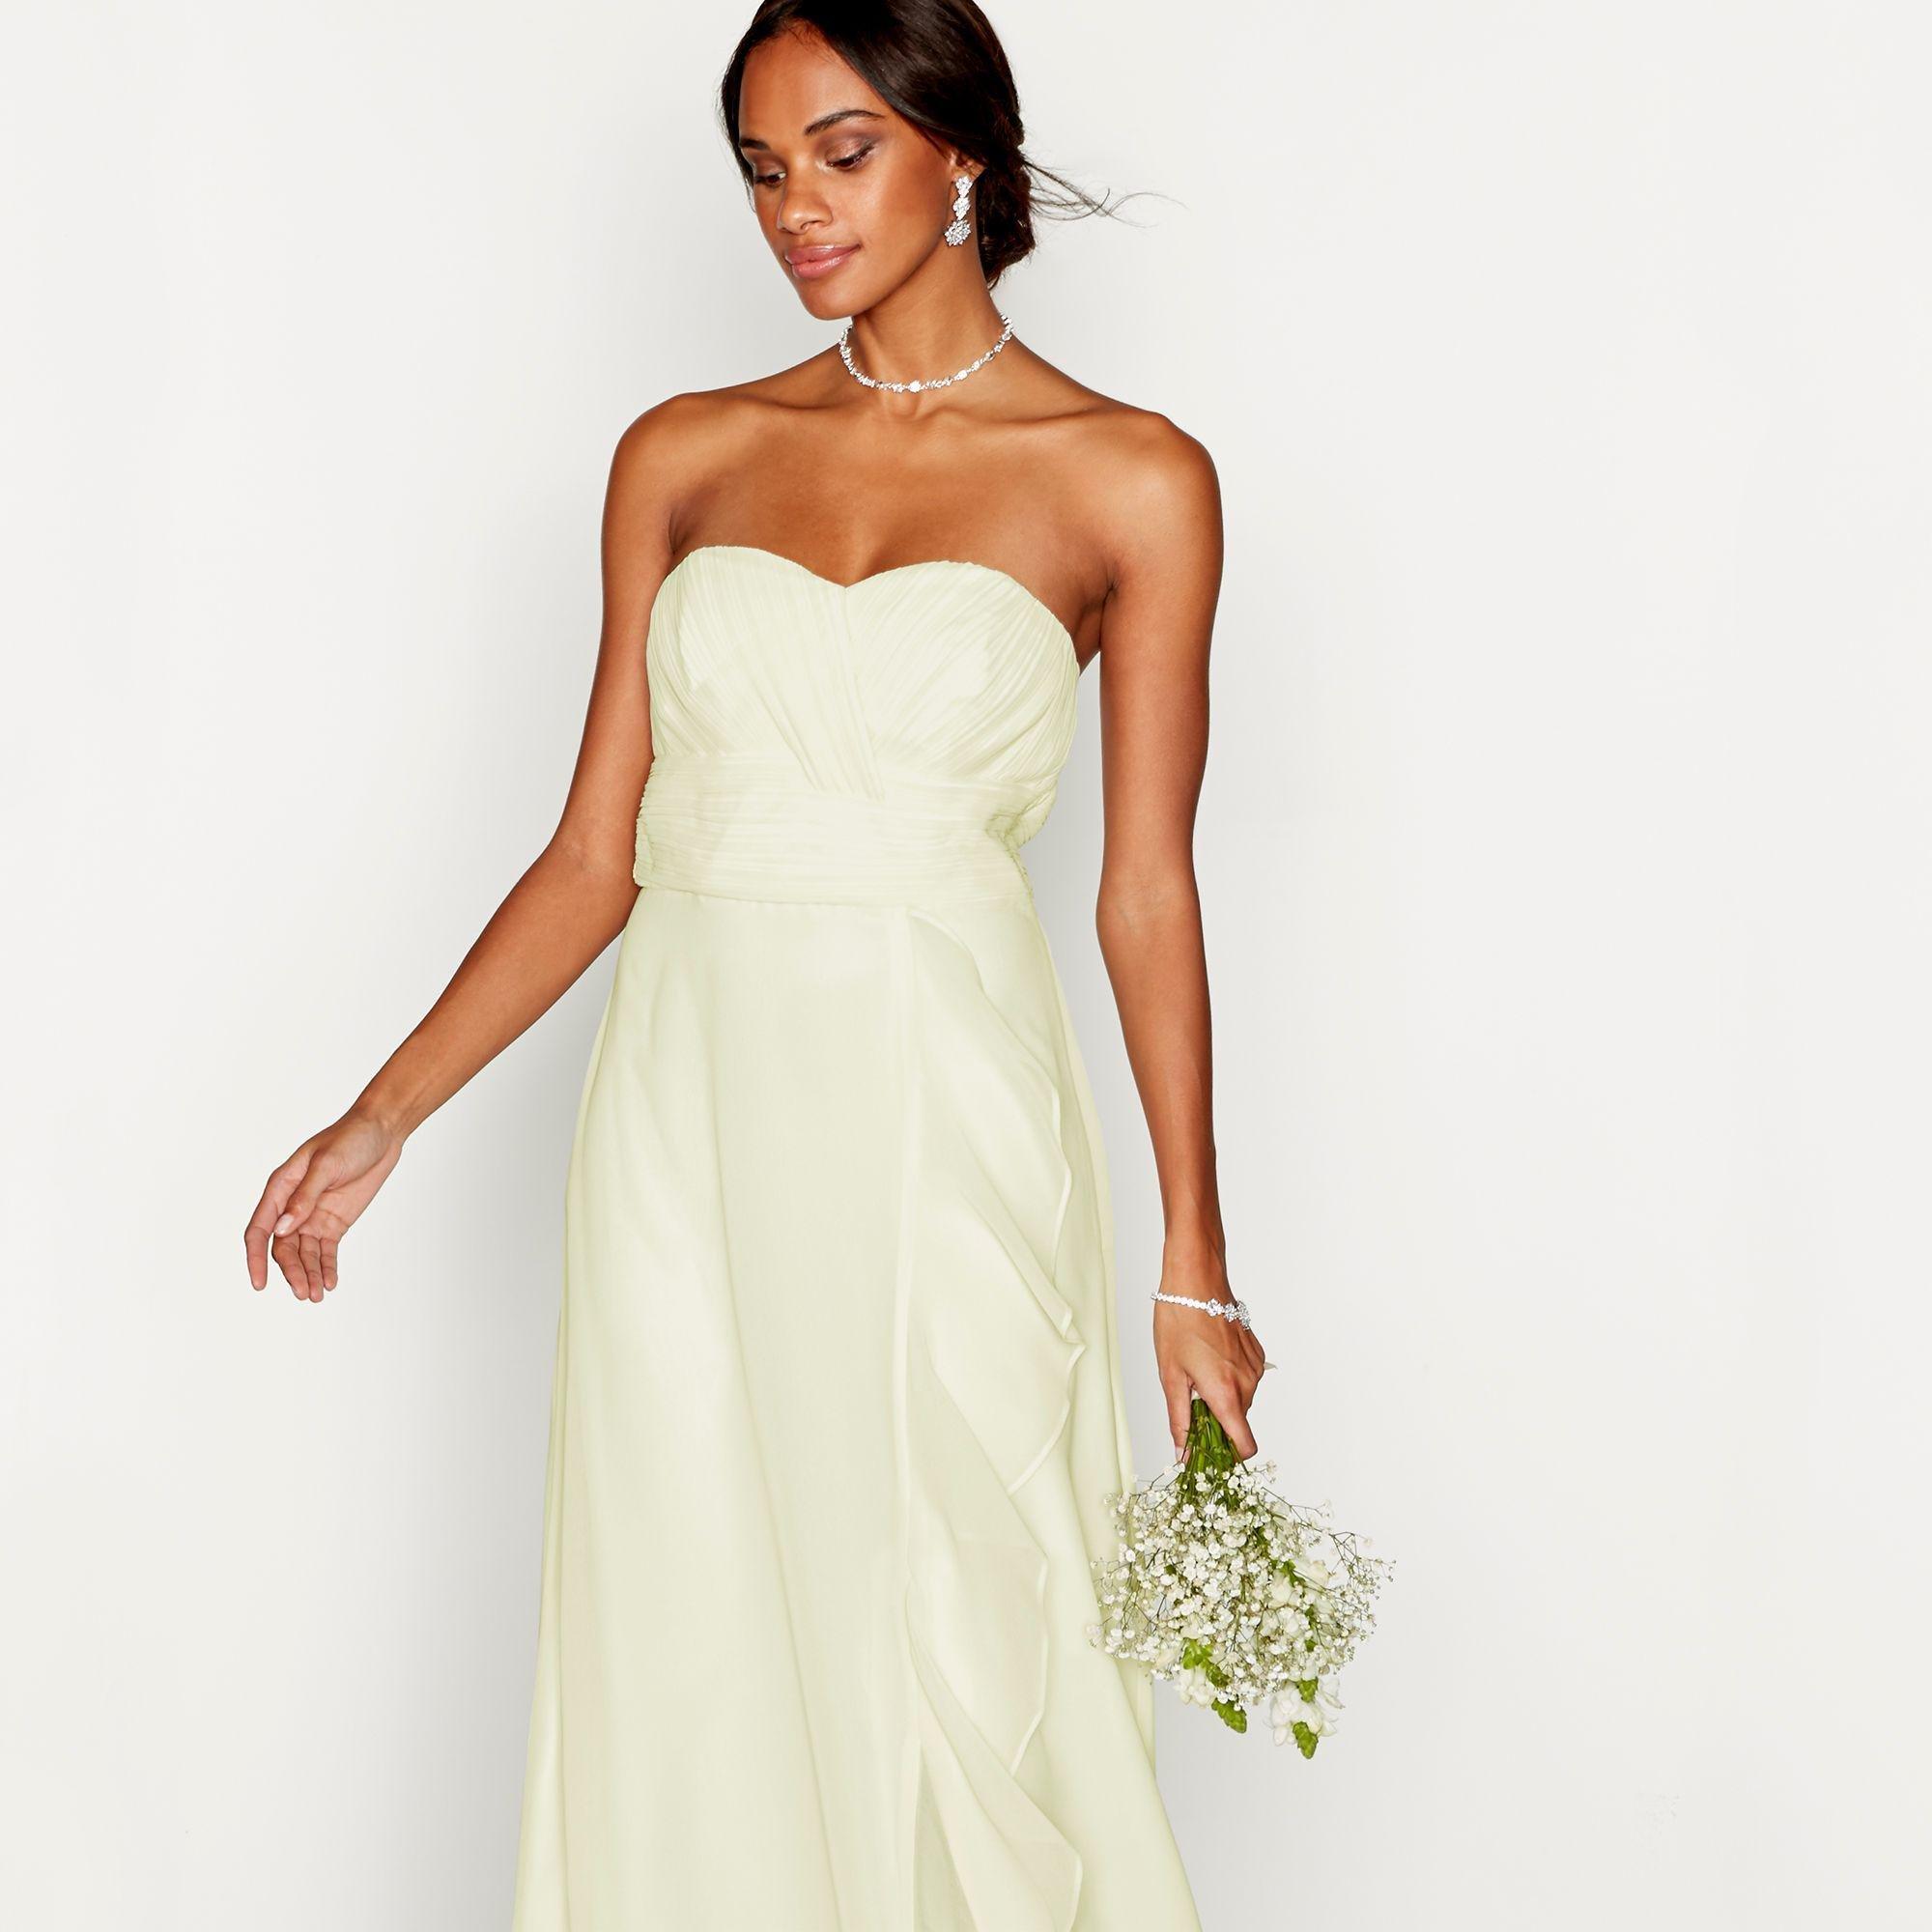 733b0e1538 Début Pale Yellow Chiffon 'sara' Strapless Plus Size Bridesmaid ...